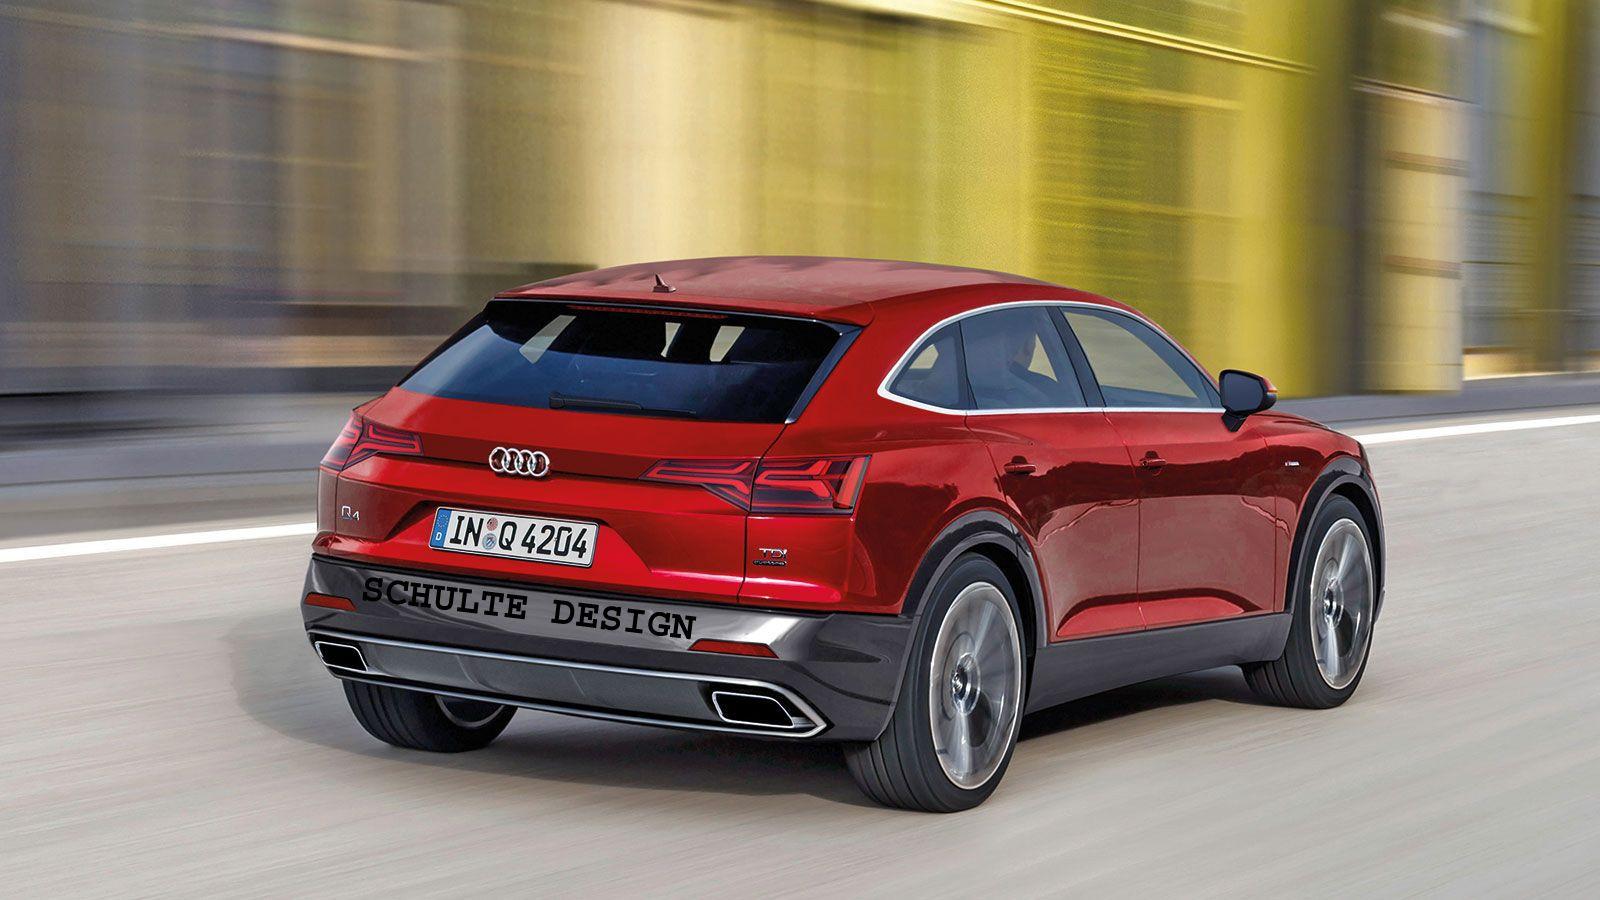 Audi Q4 ESS - audi, audi ess, audi q4